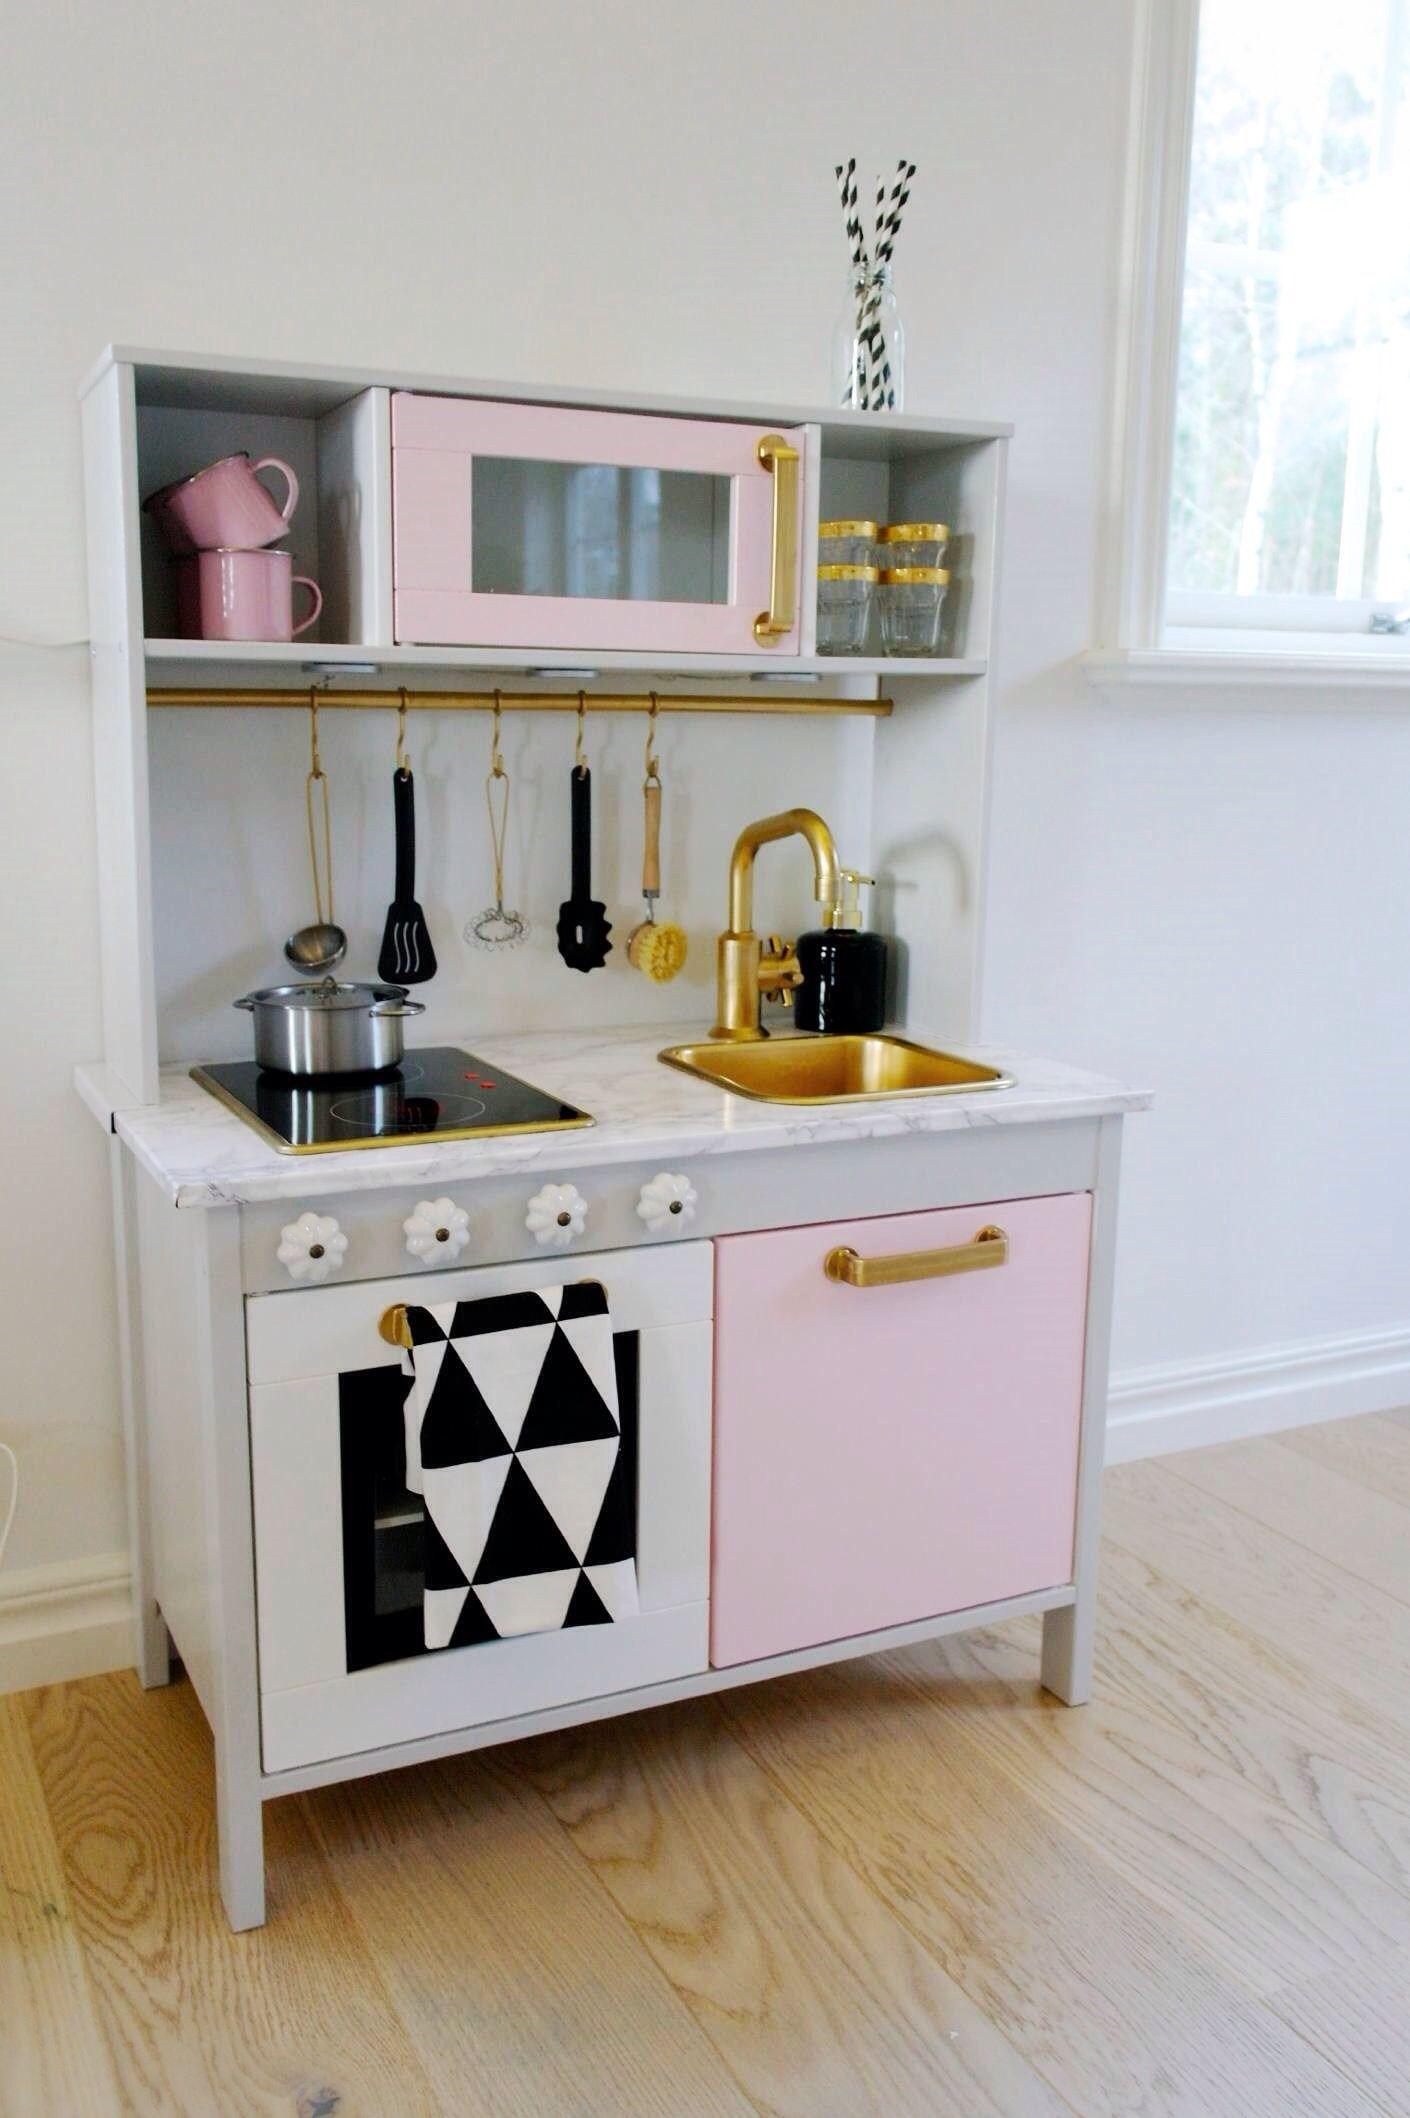 ikea duktig play kitchen hack kids room lovely girls room